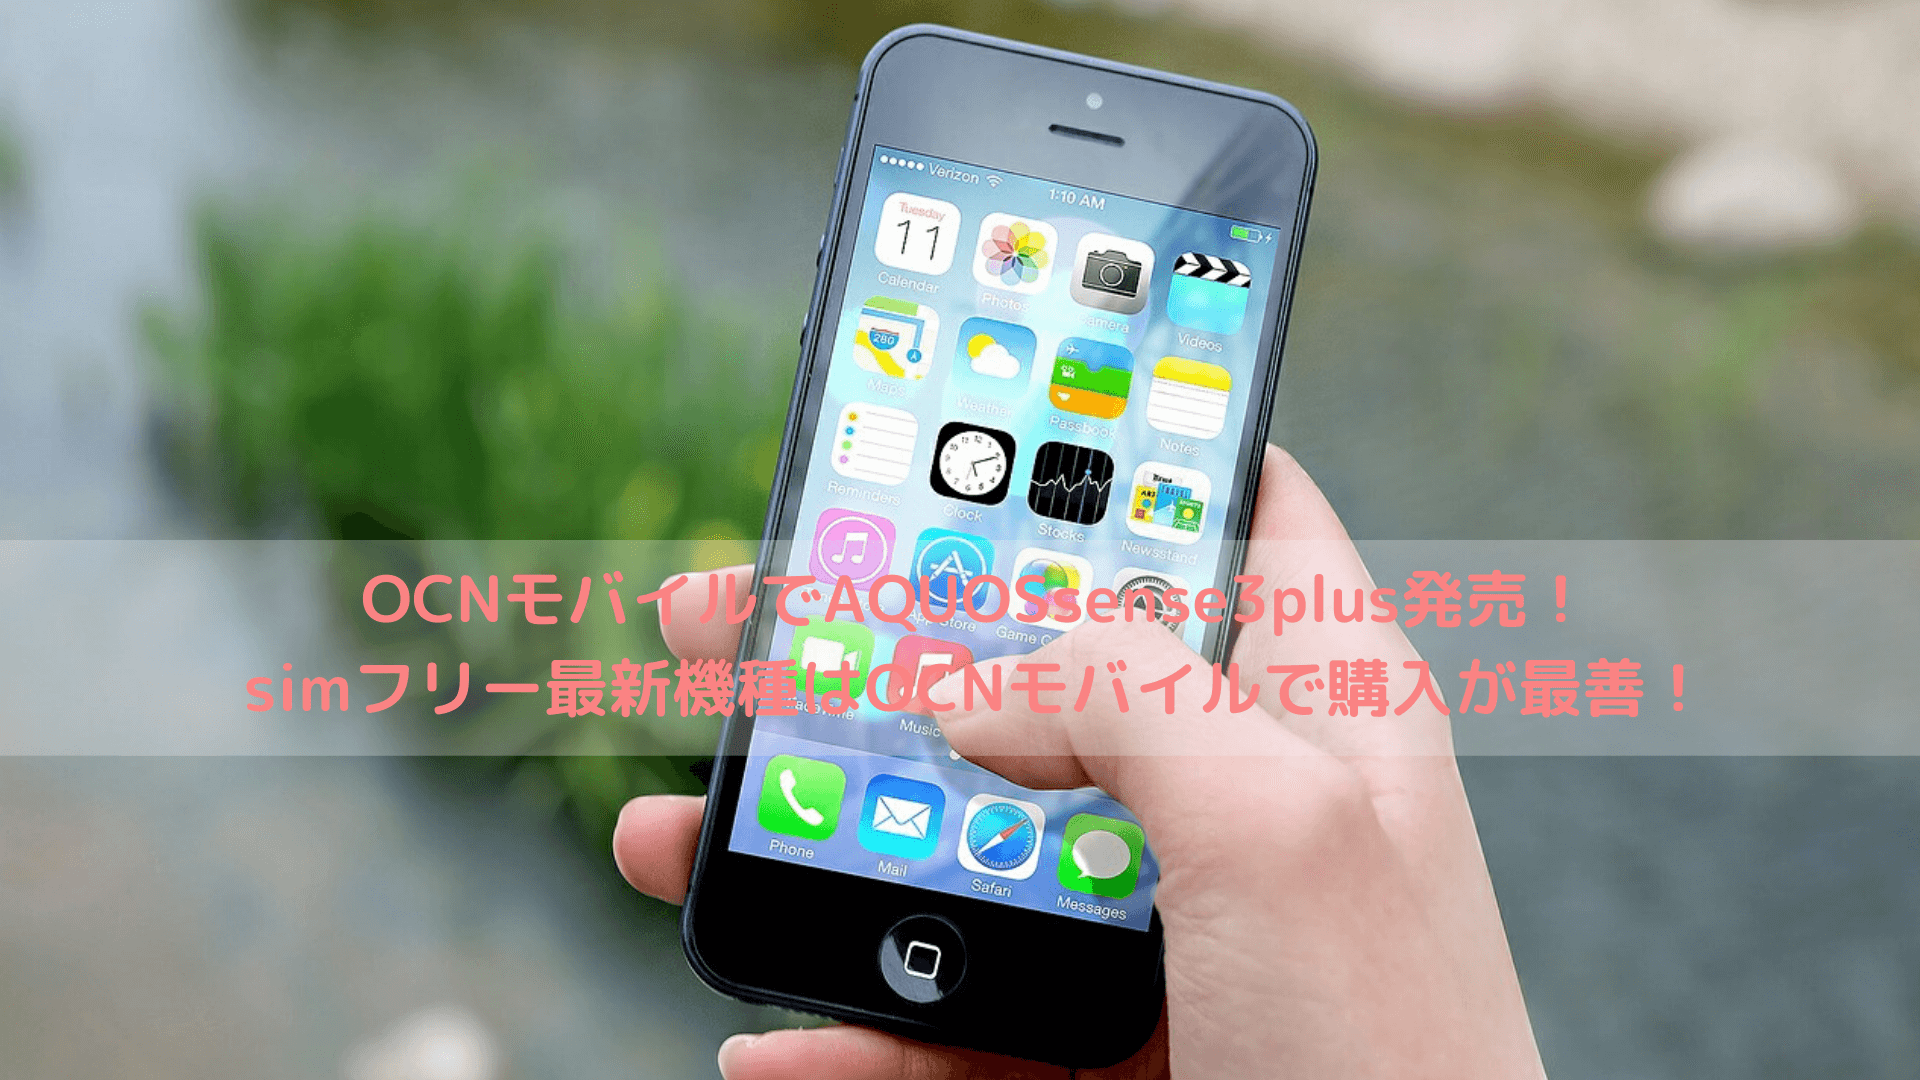 OCNモバイルでAQUOSsense3plus発売!simフリー最新機種はOCNモバイルで購入が最善!